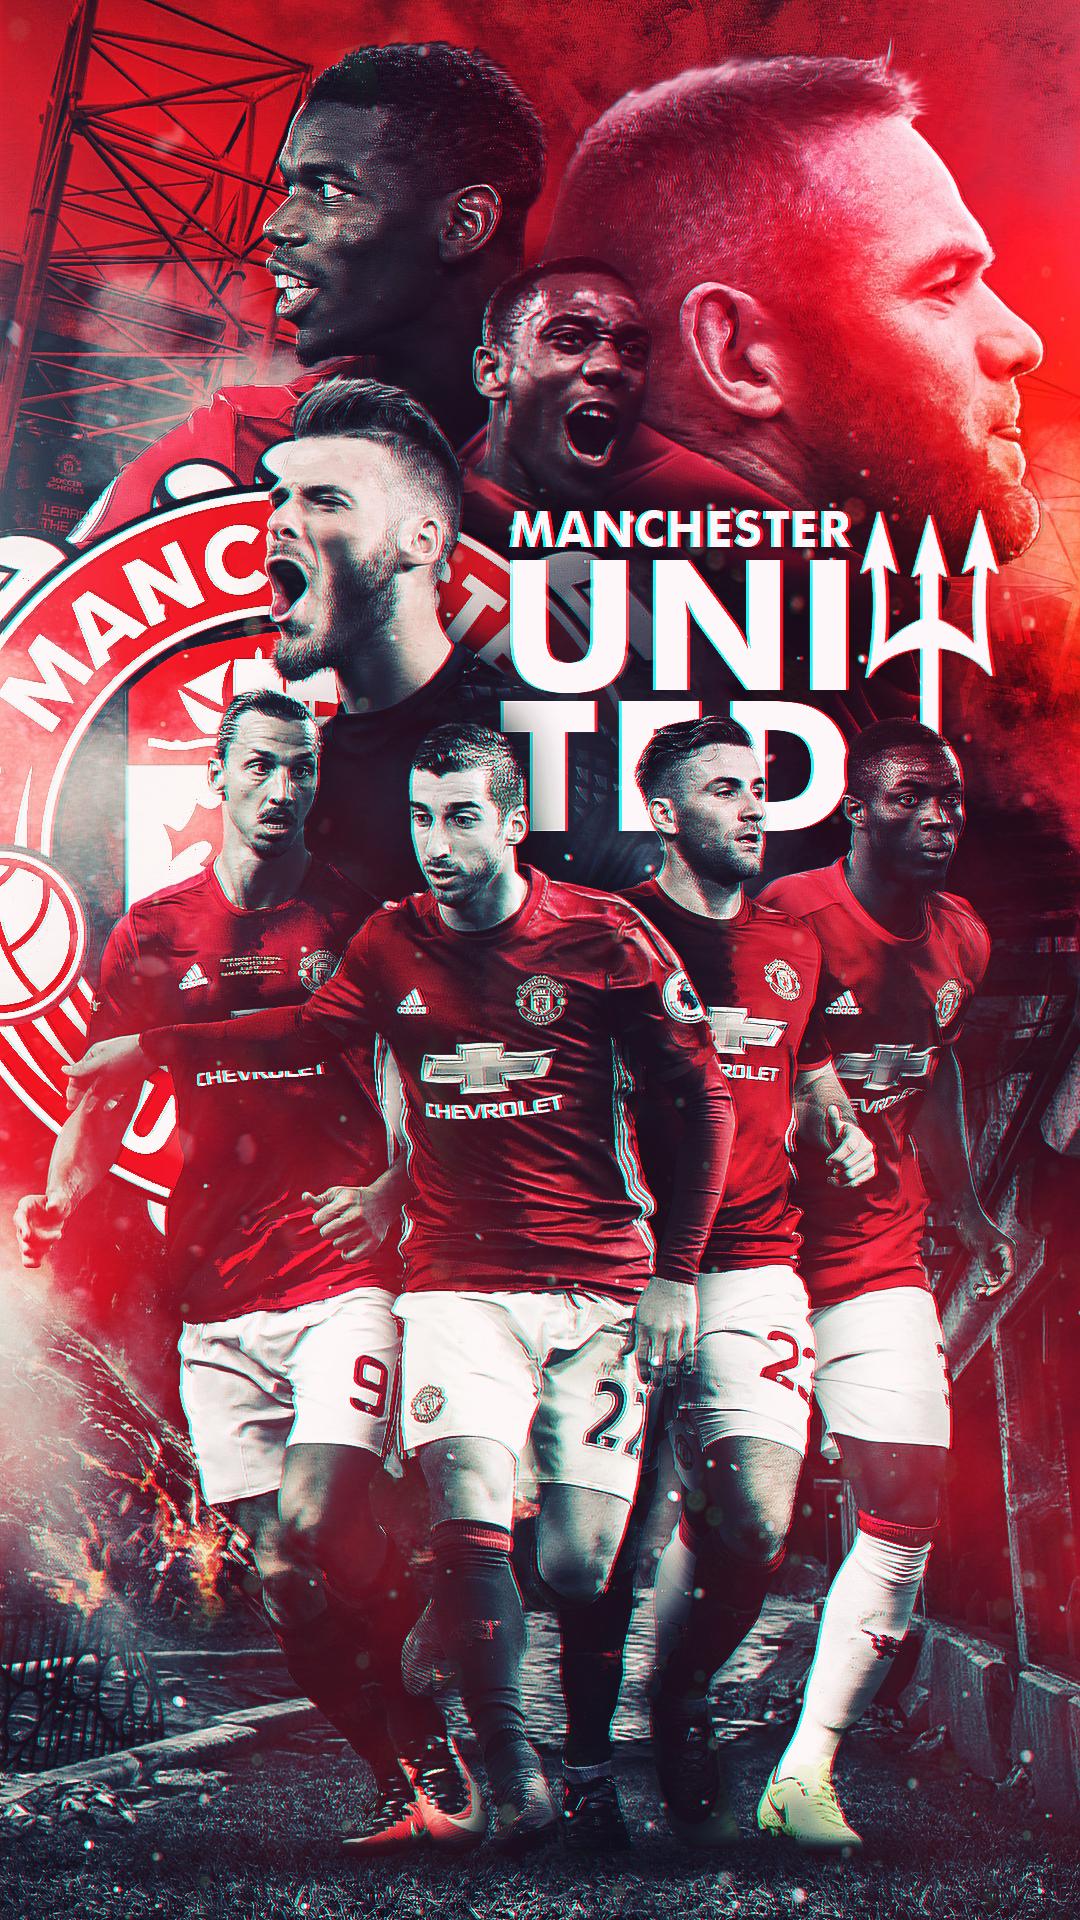 Manchester United - HD Wallpaper by Kerimov23 on DeviantArt